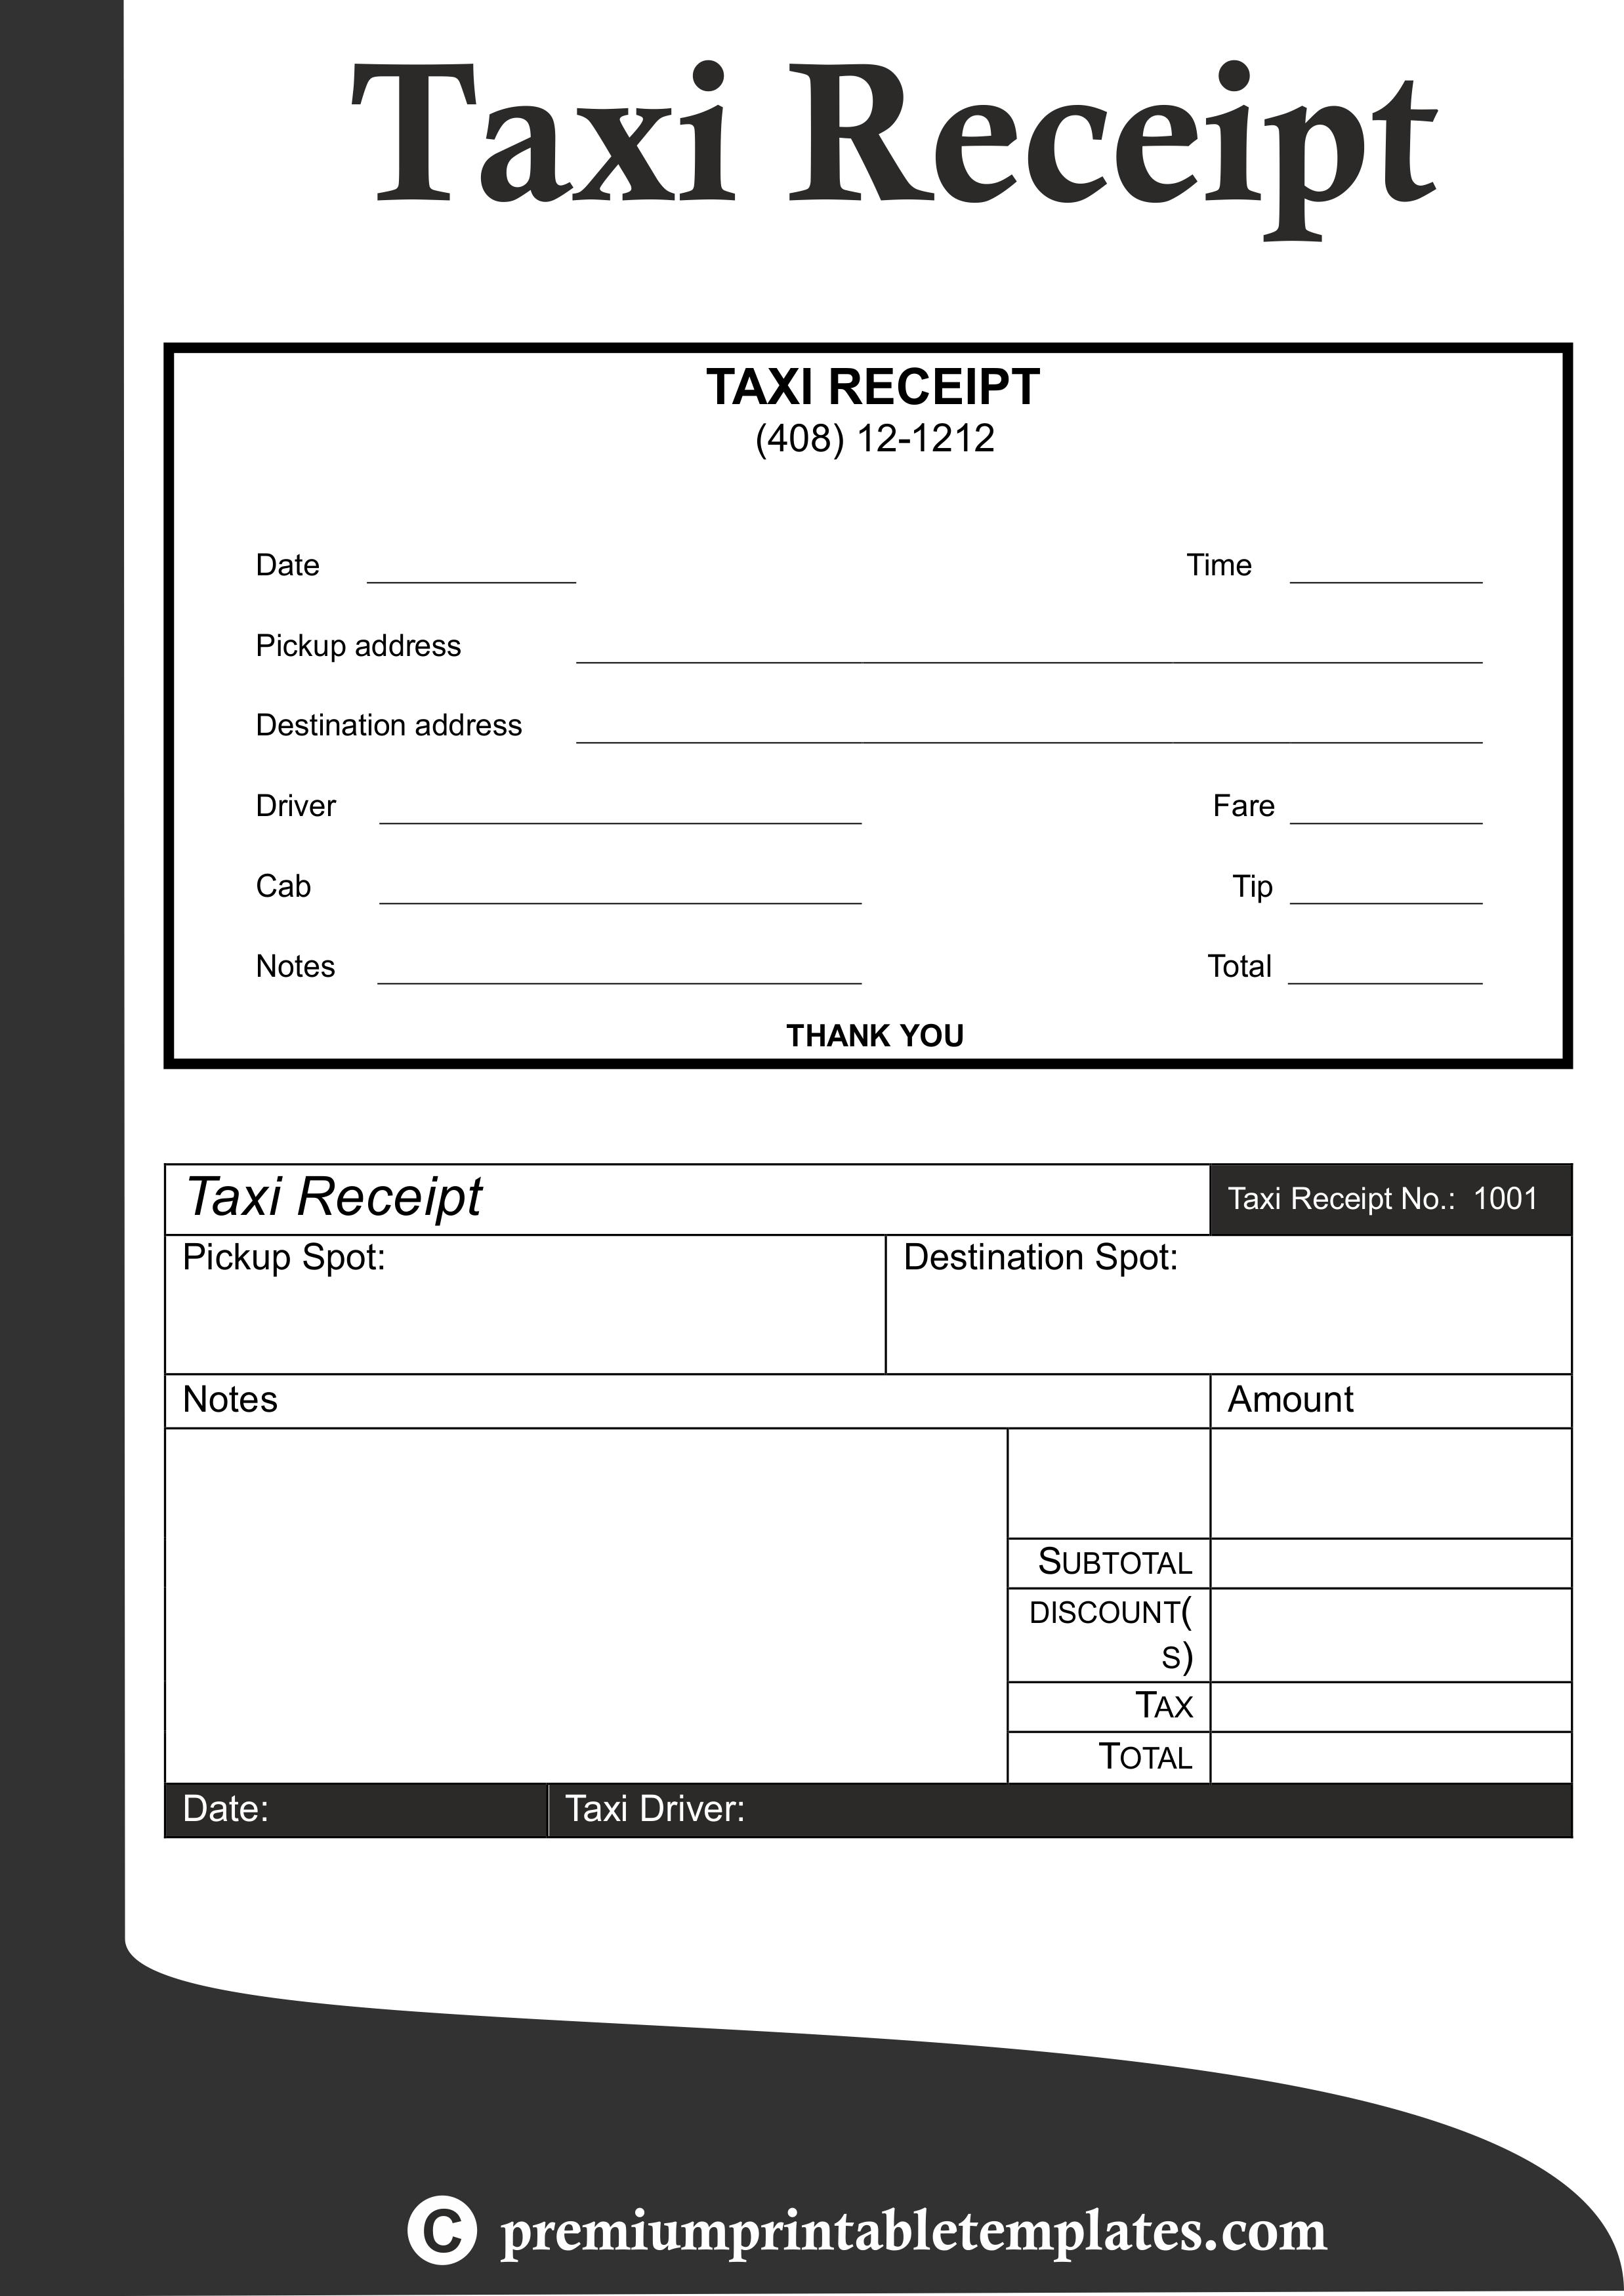 taxi receipt templates receipt template templates taxi service invoice template